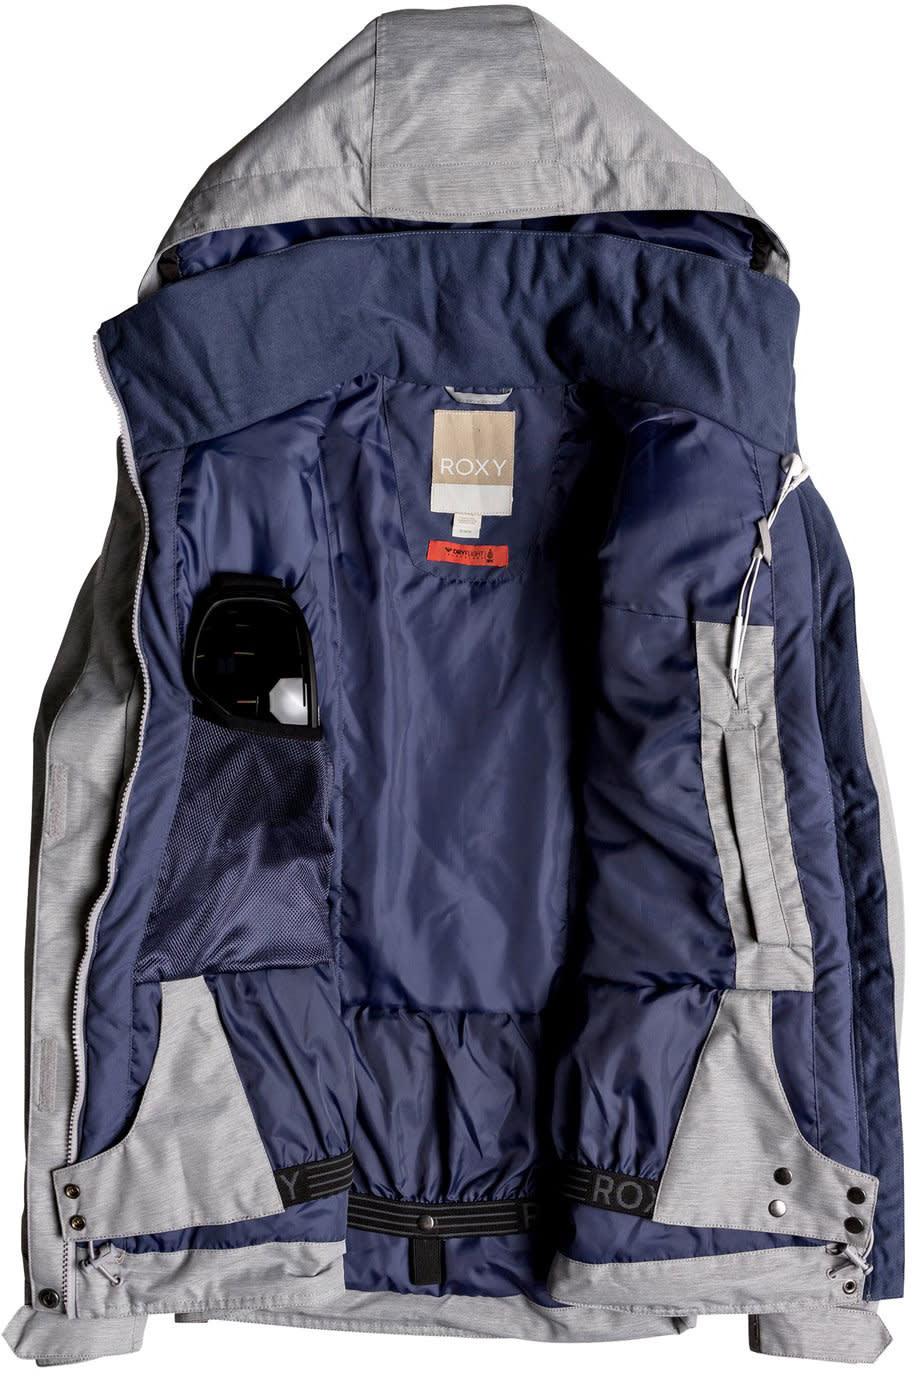 Roxy Billie Snowboard Jacket Womens